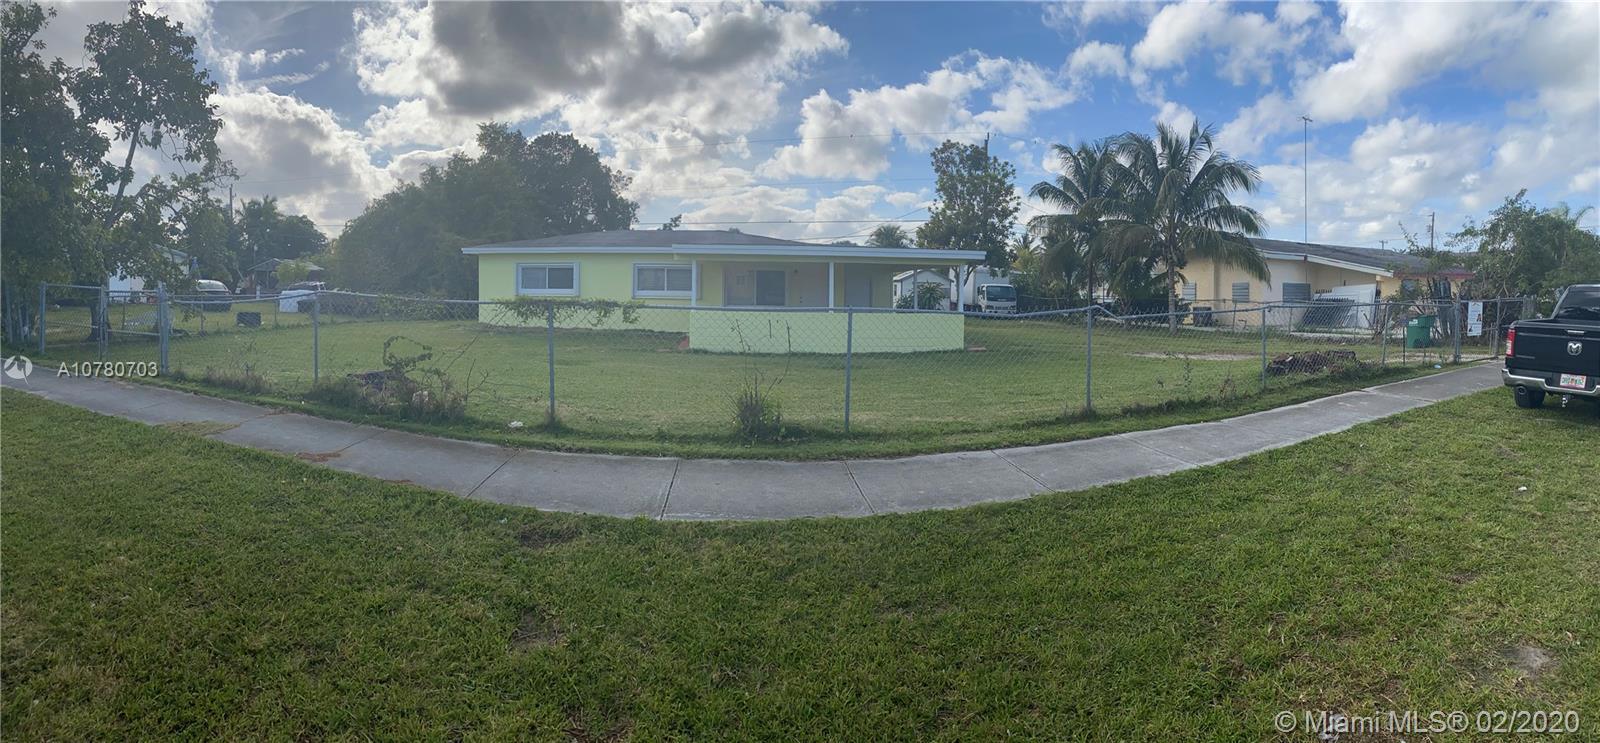 26900 SW 142nd Ave Property Photo